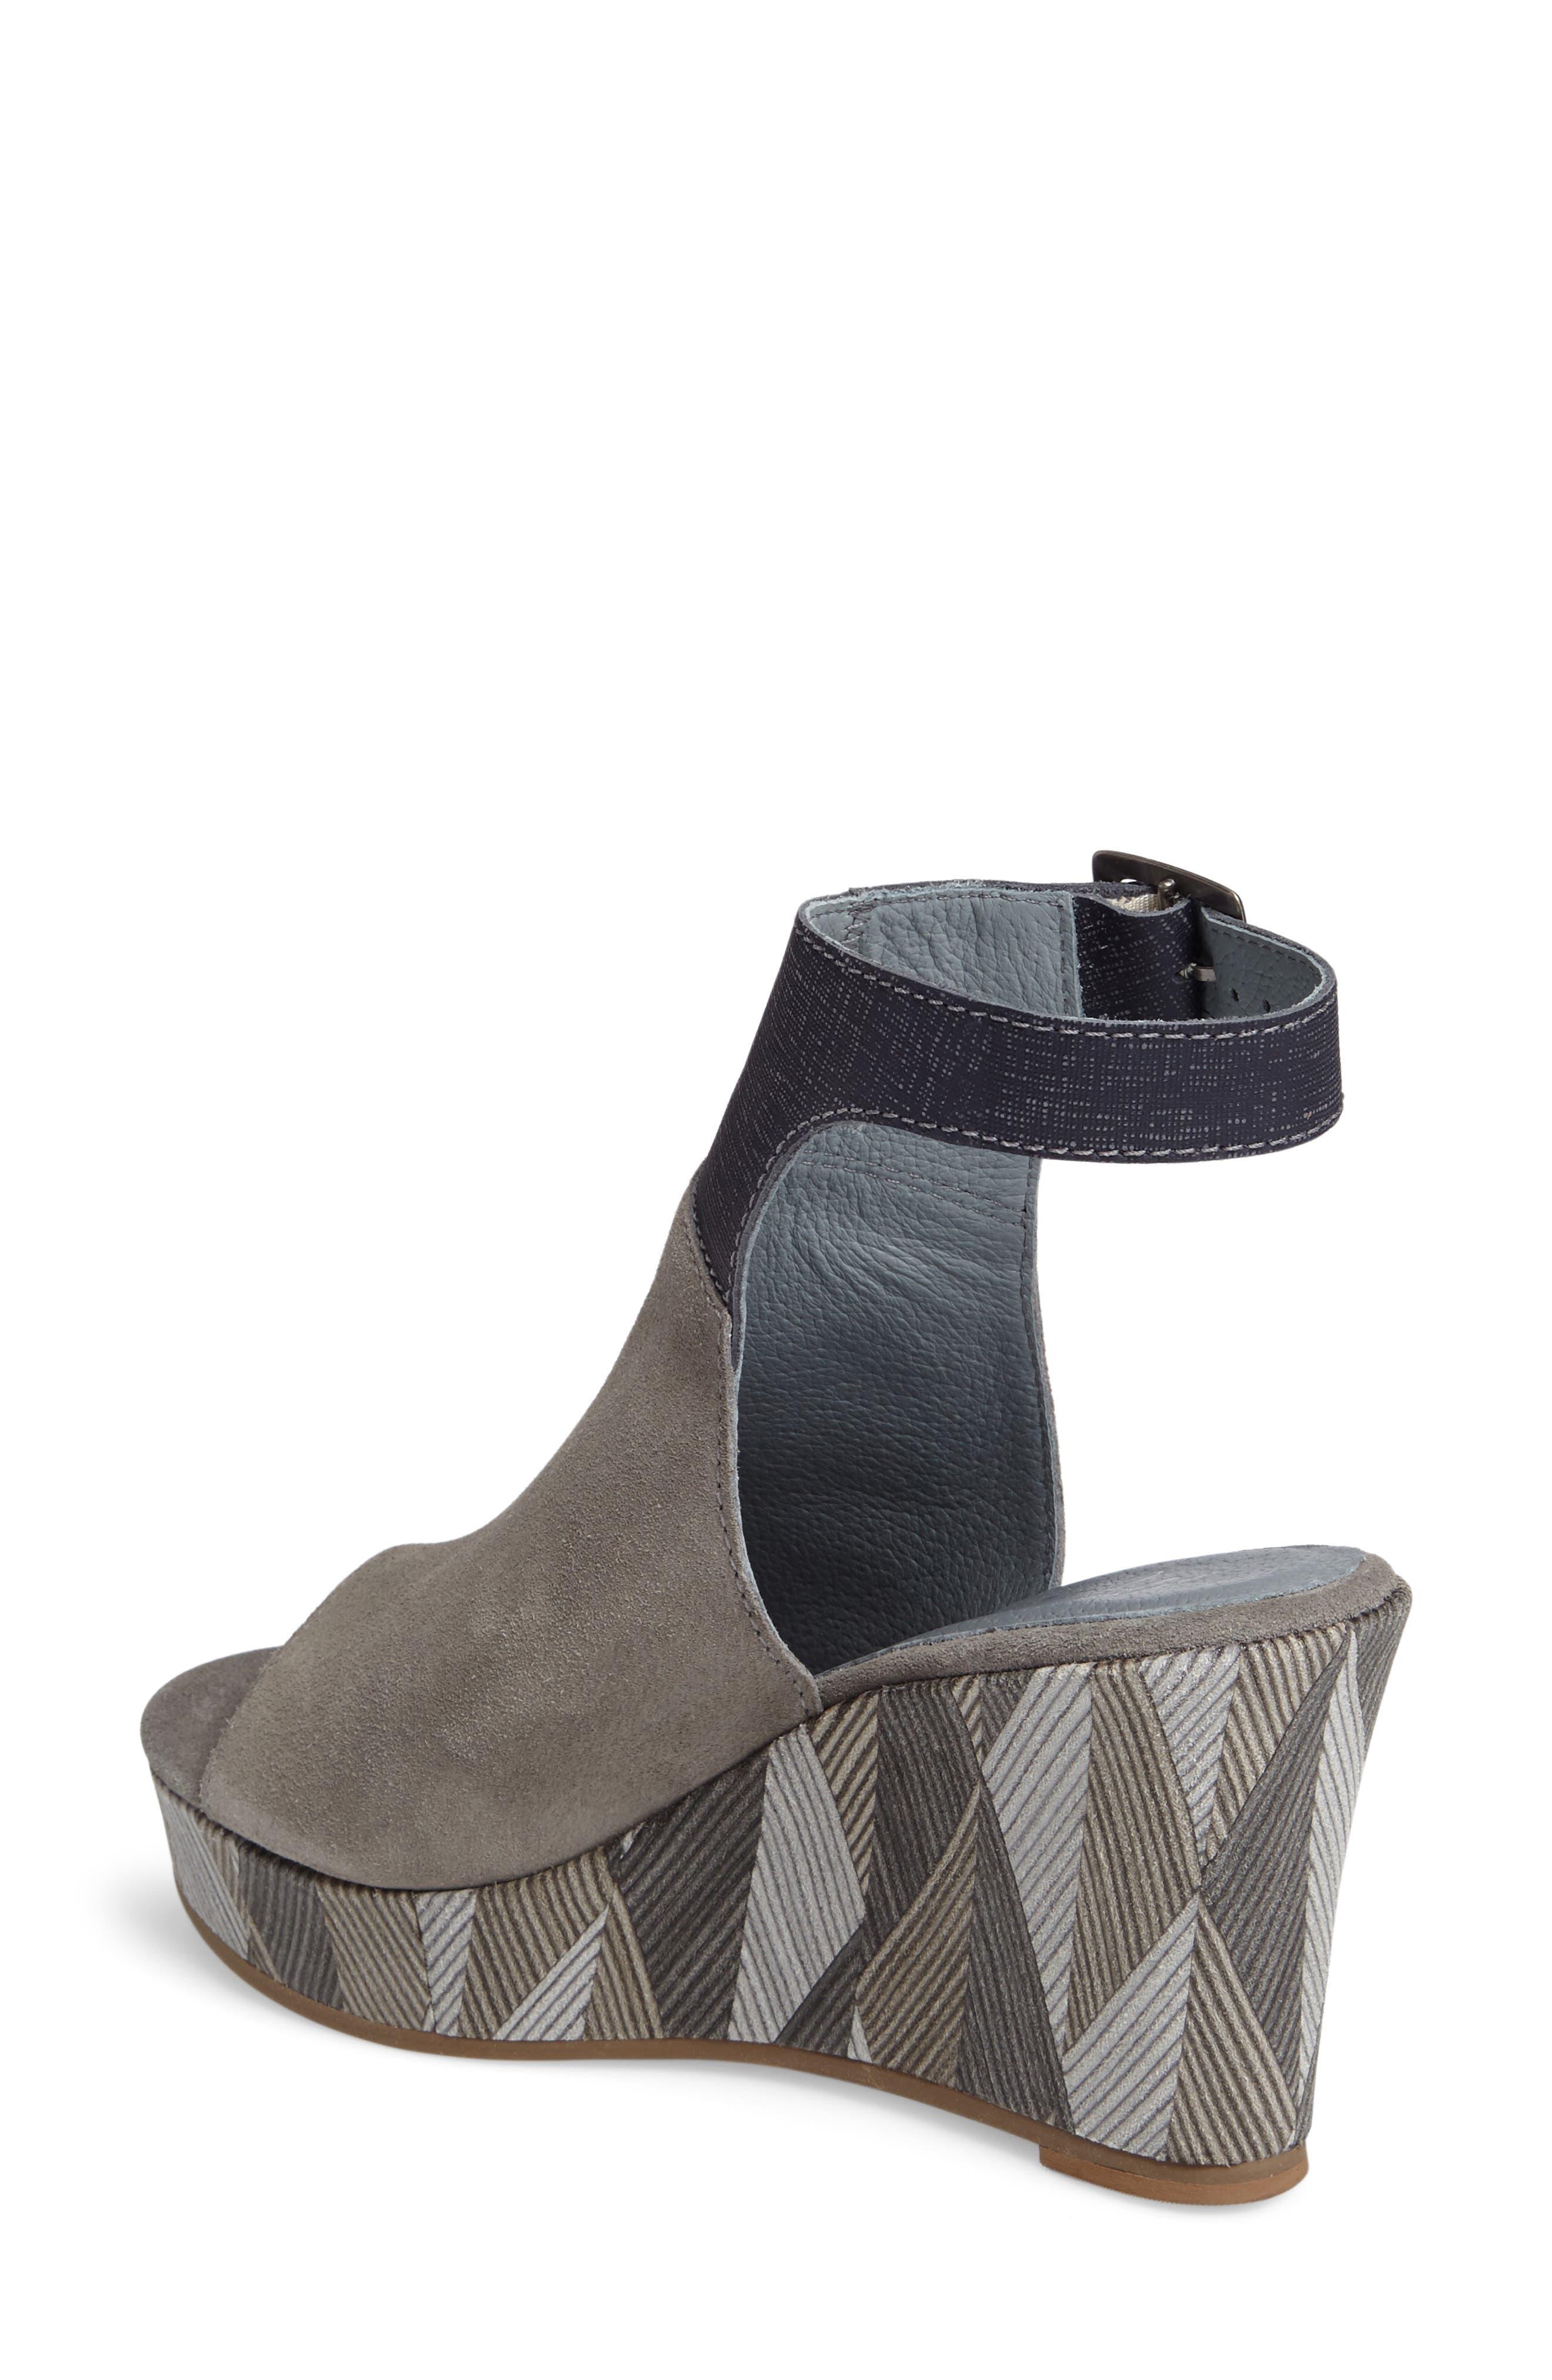 Harlequin Wedge Sandal,                             Alternate thumbnail 2, color,                             029